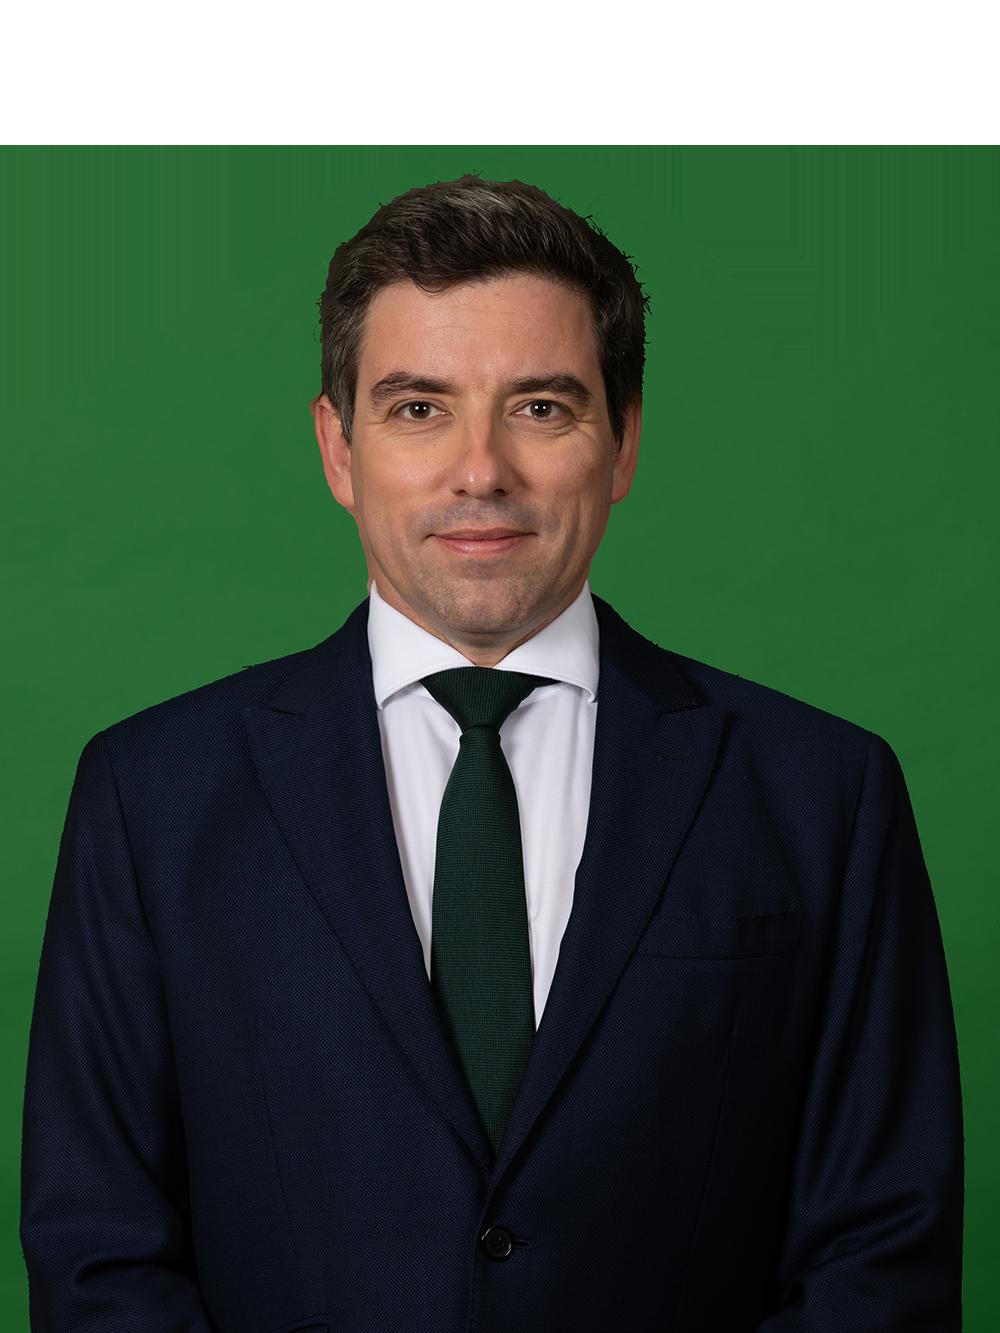 Pedro Almeida Cabral coordenador e advogado de contencioso